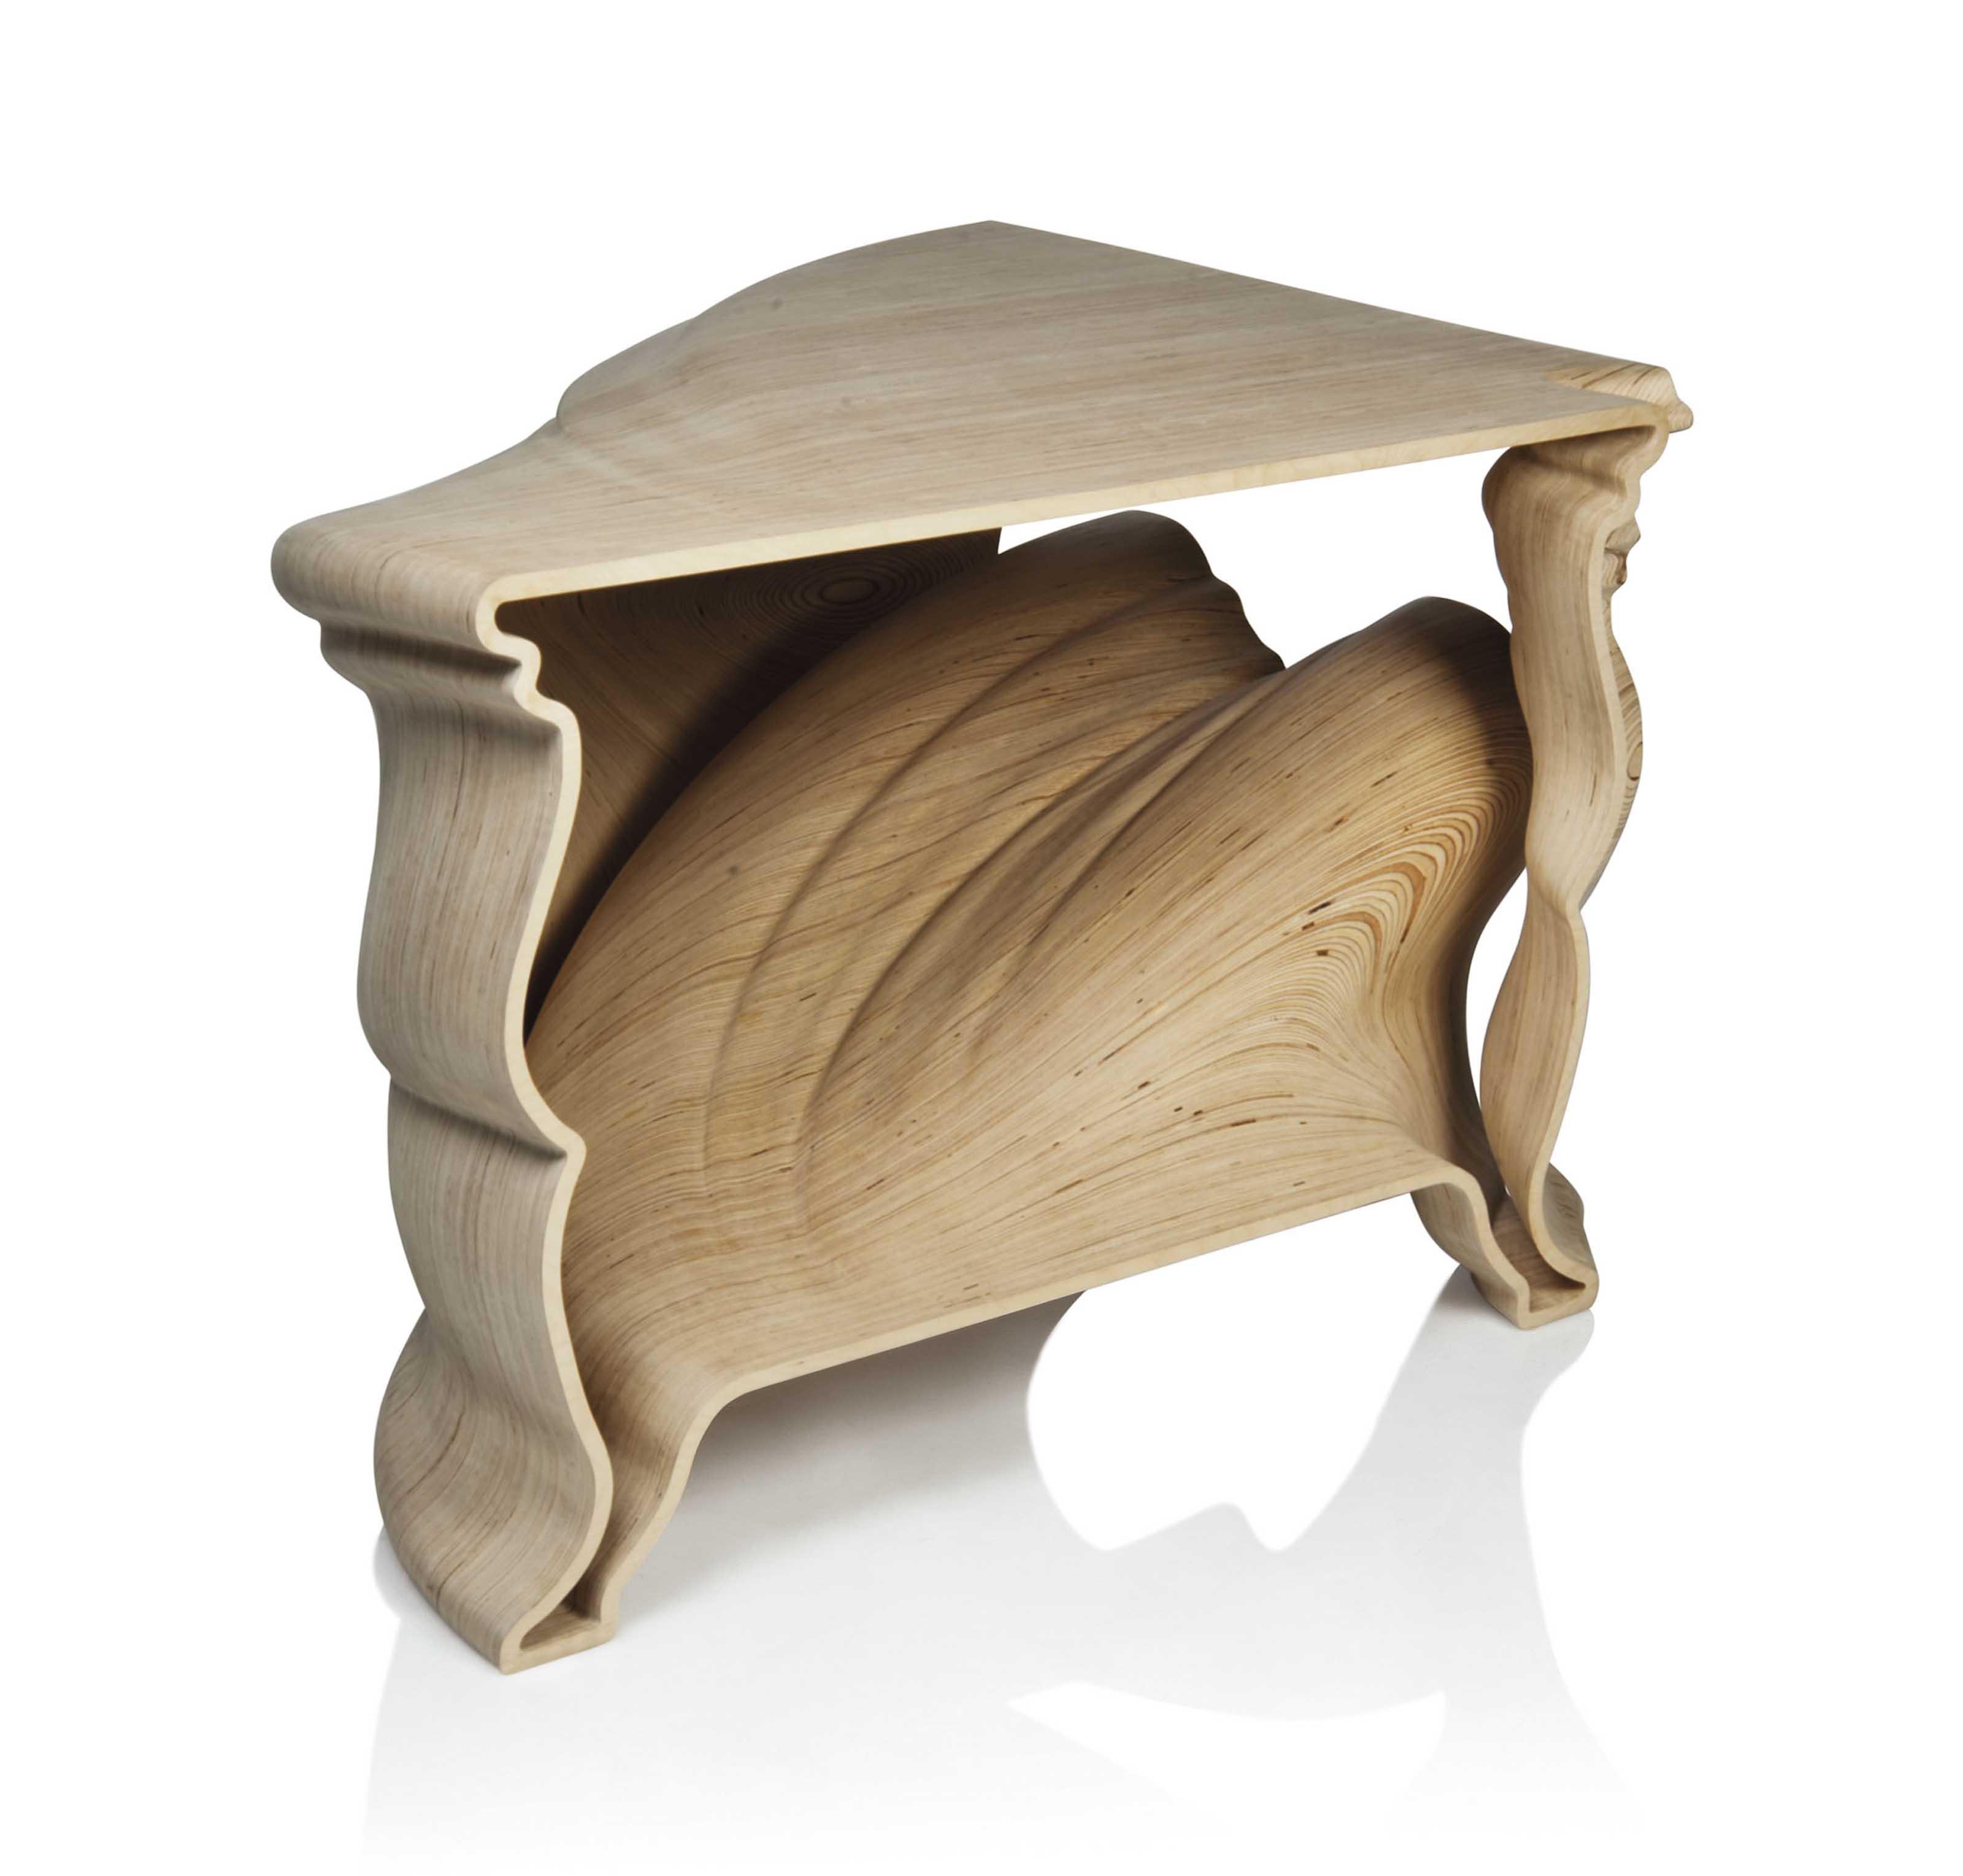 JEROEN VERHOEVEN b  1976 | 'CINDERELLA TABLE', 2004-2007 | Furniture